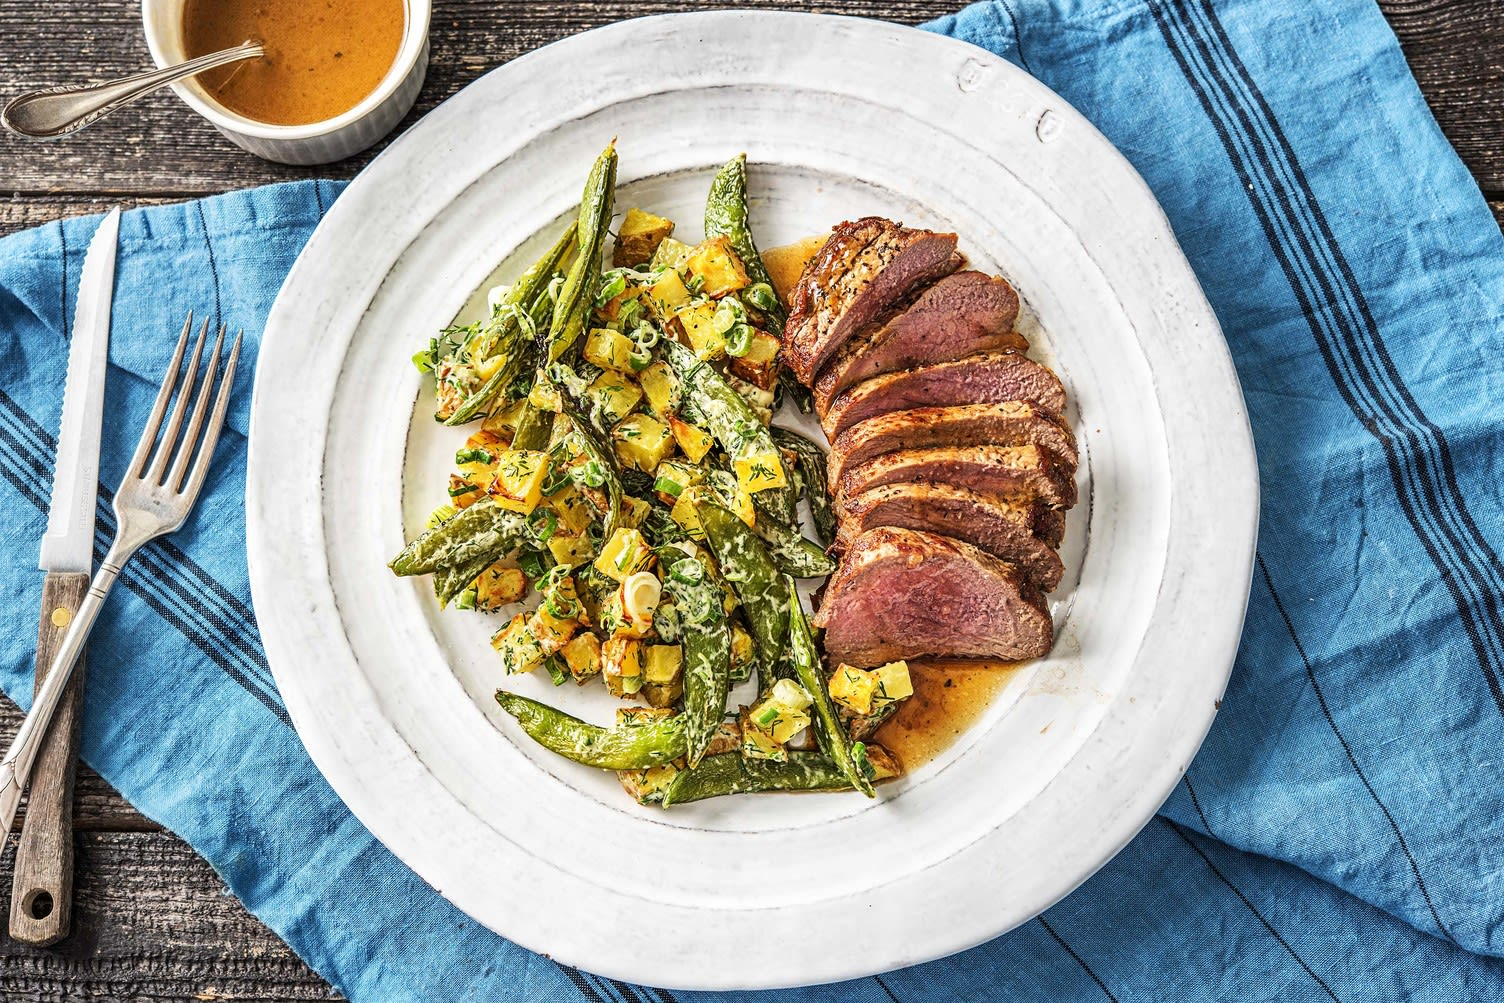 Pan-Seared Steak au Jus